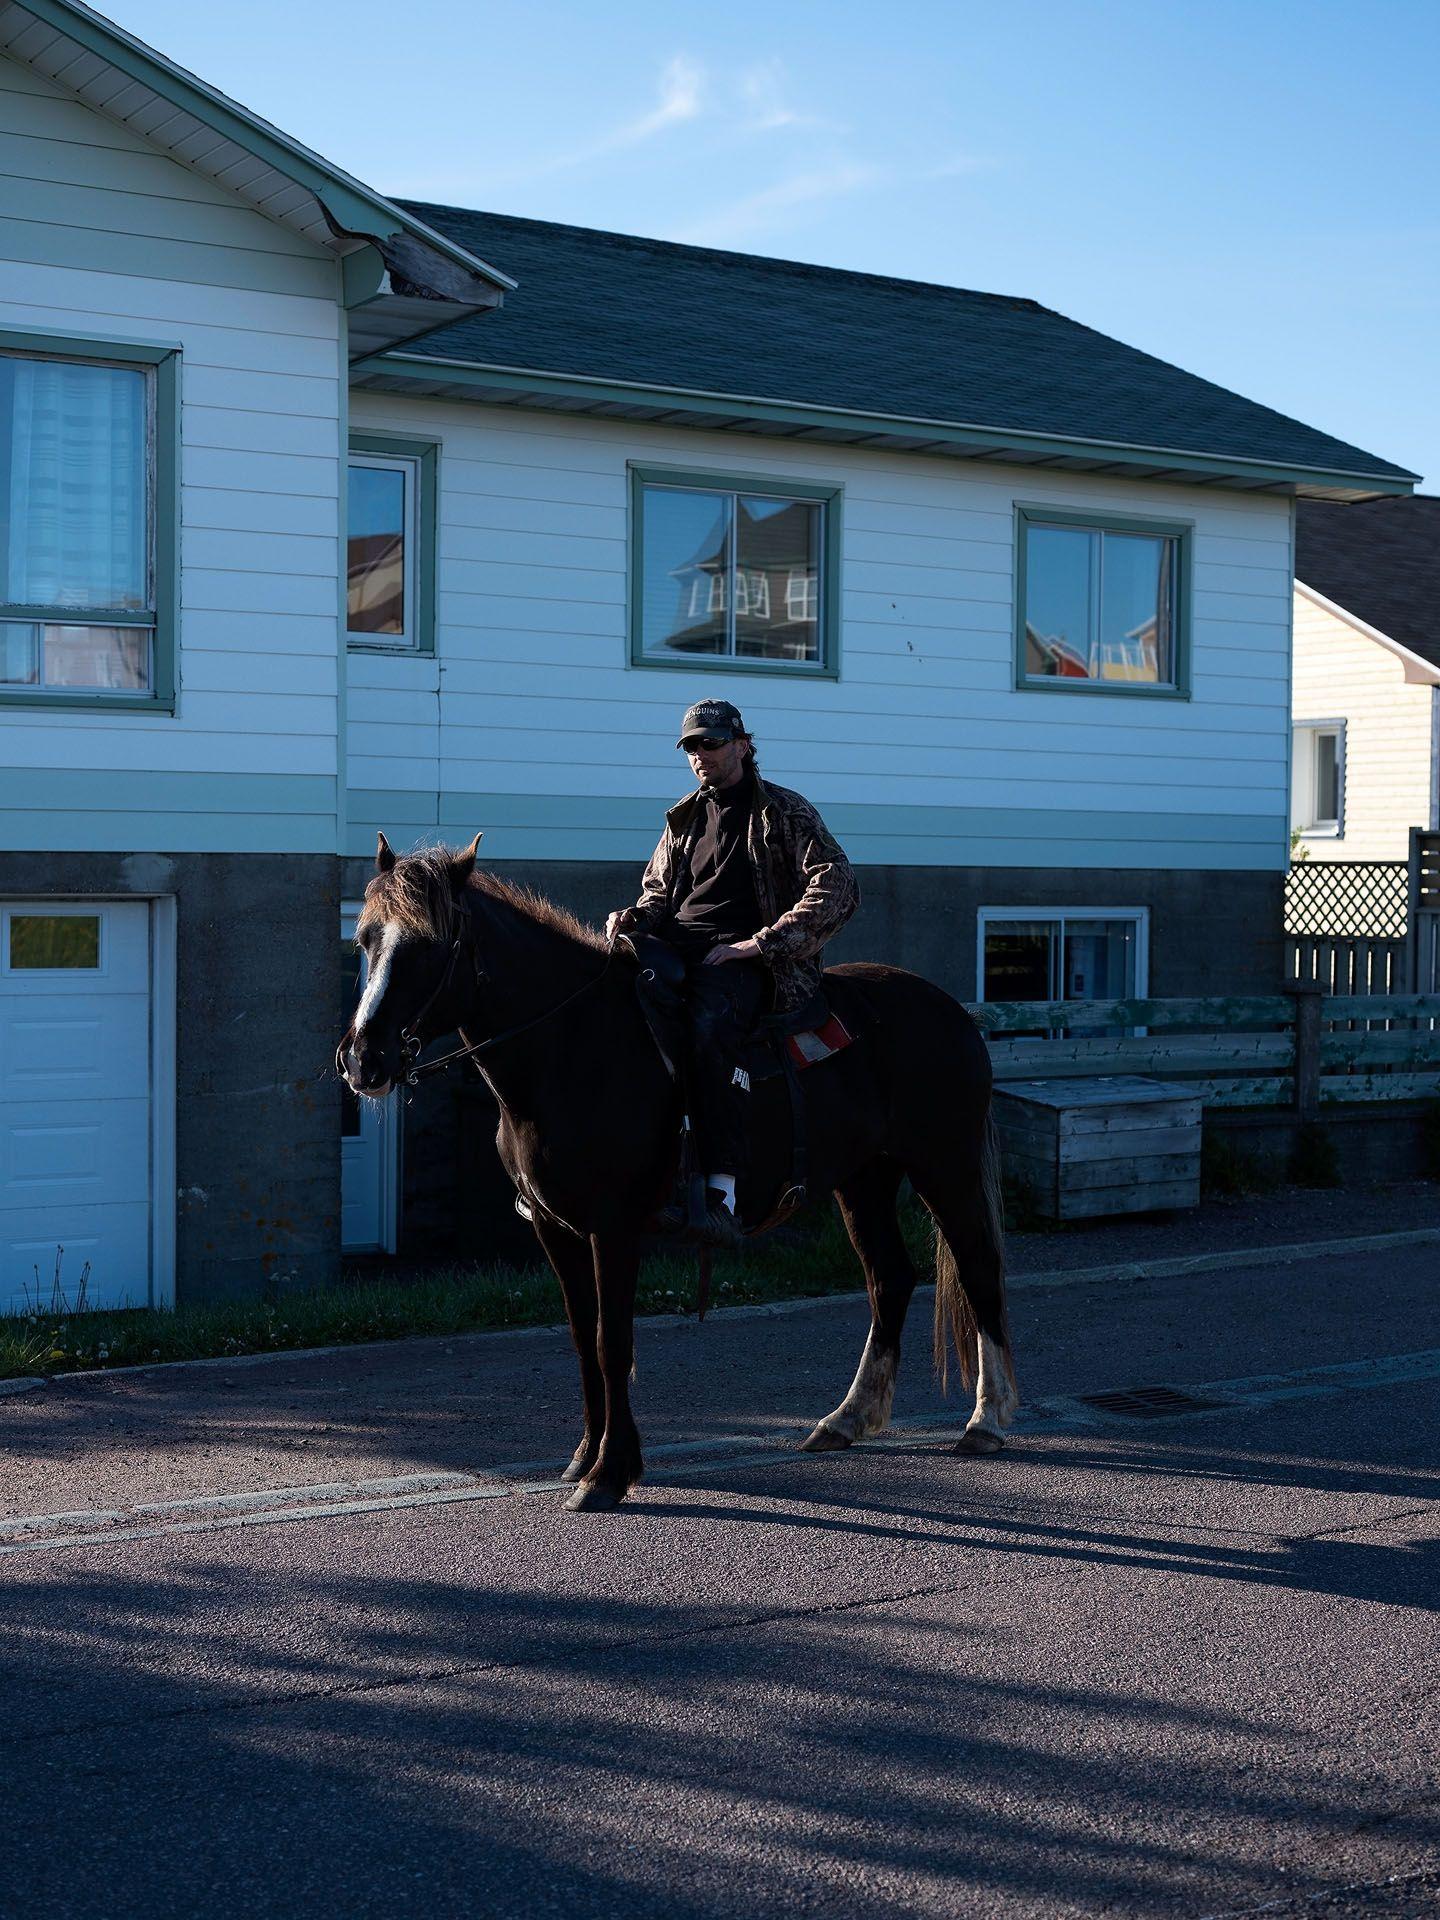 man horseback riding in the street wearing sunglasses by Guillaume Simoneau in Saint-Pierre-et-Miquelon for M le mag Le Monde